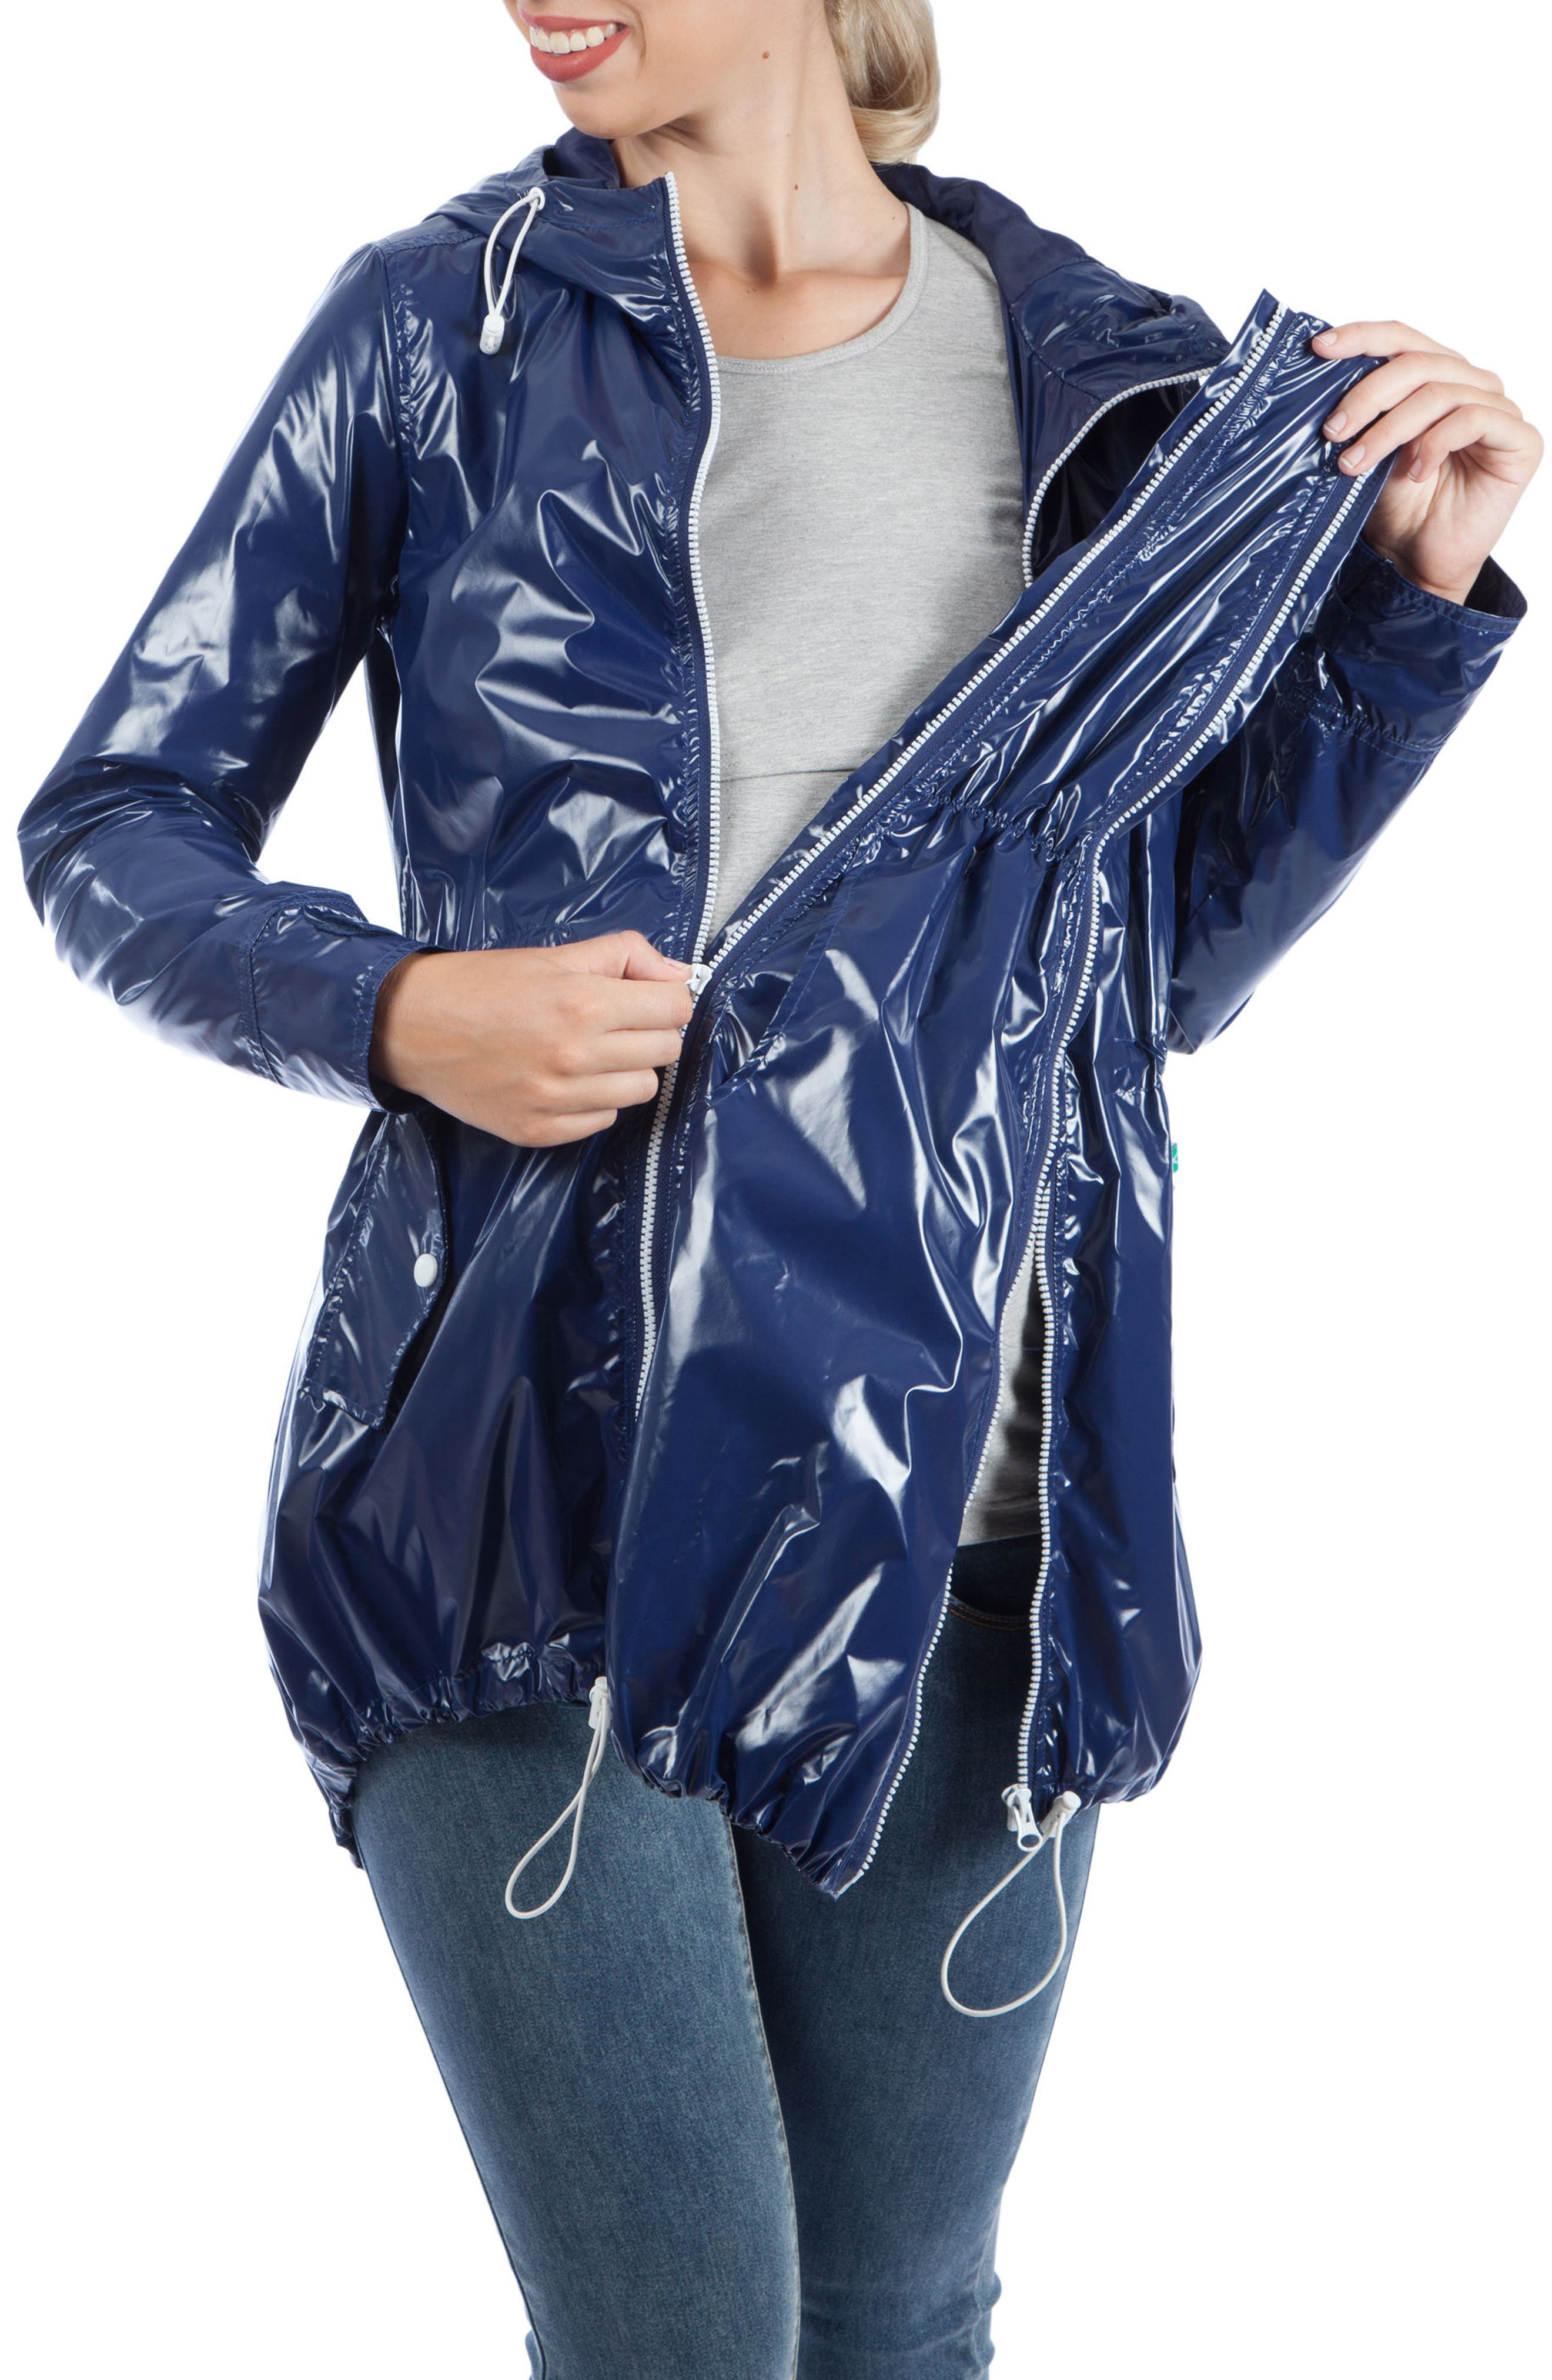 Waterproof Convertible 3-in-1 Maternity Raincoat,                             Alternate thumbnail 7, color,                             BRIGHT NAVY